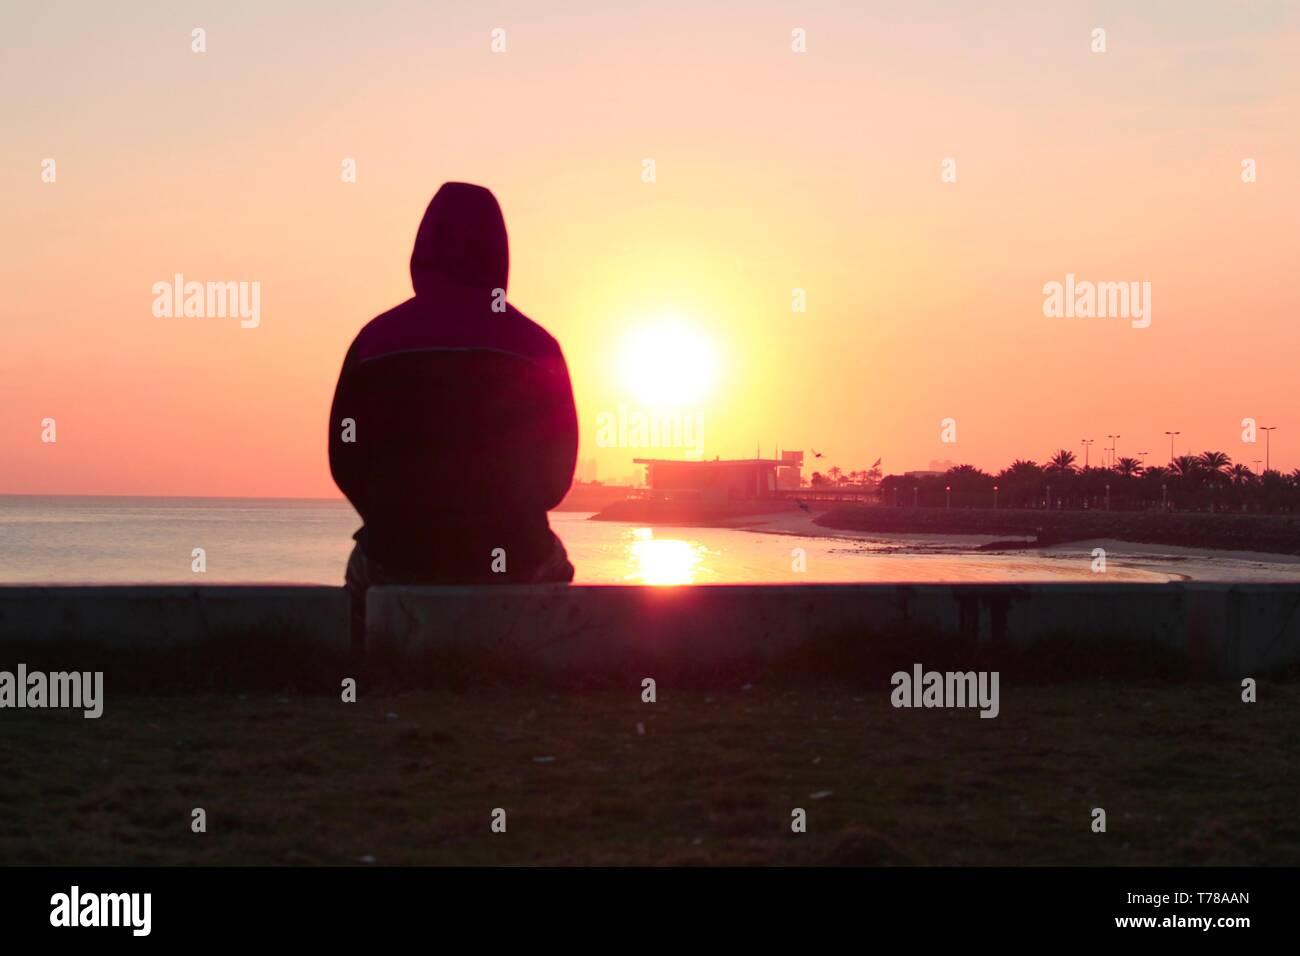 the rising sun - Stock Image